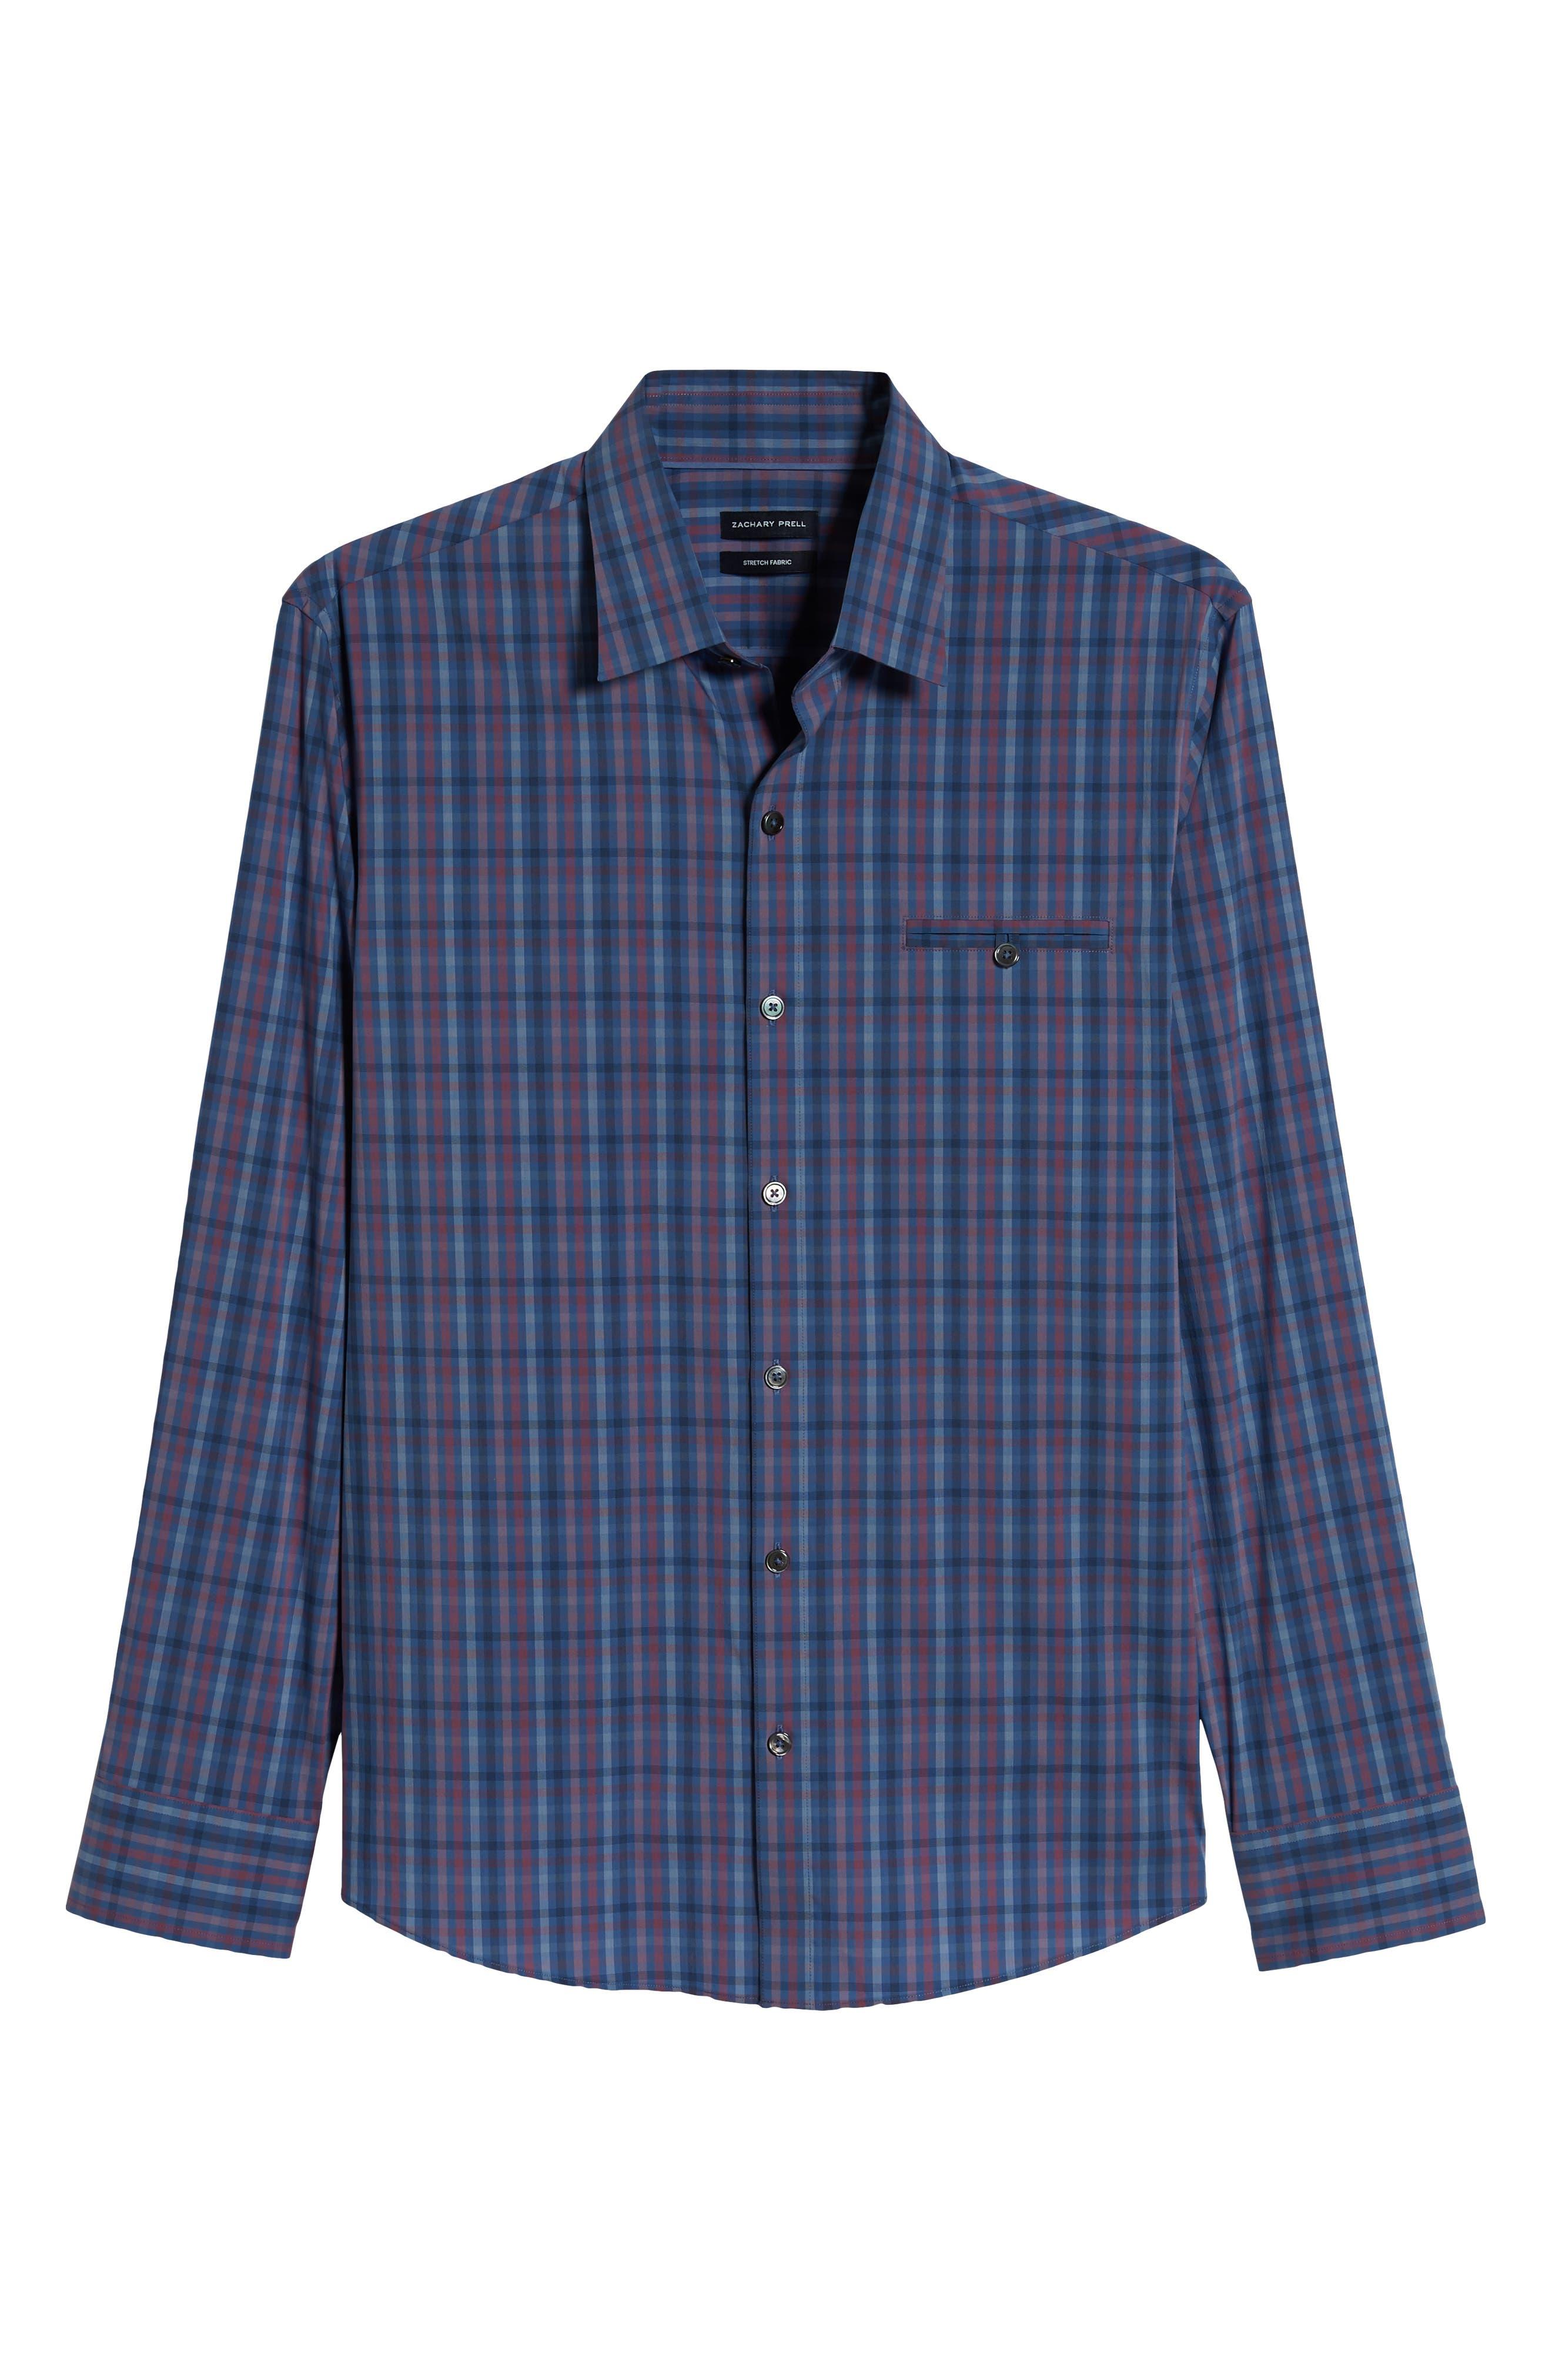 ZACHARY PRELL, Guastella Regular Fit Sport Shirt, Alternate thumbnail 5, color, AZURE